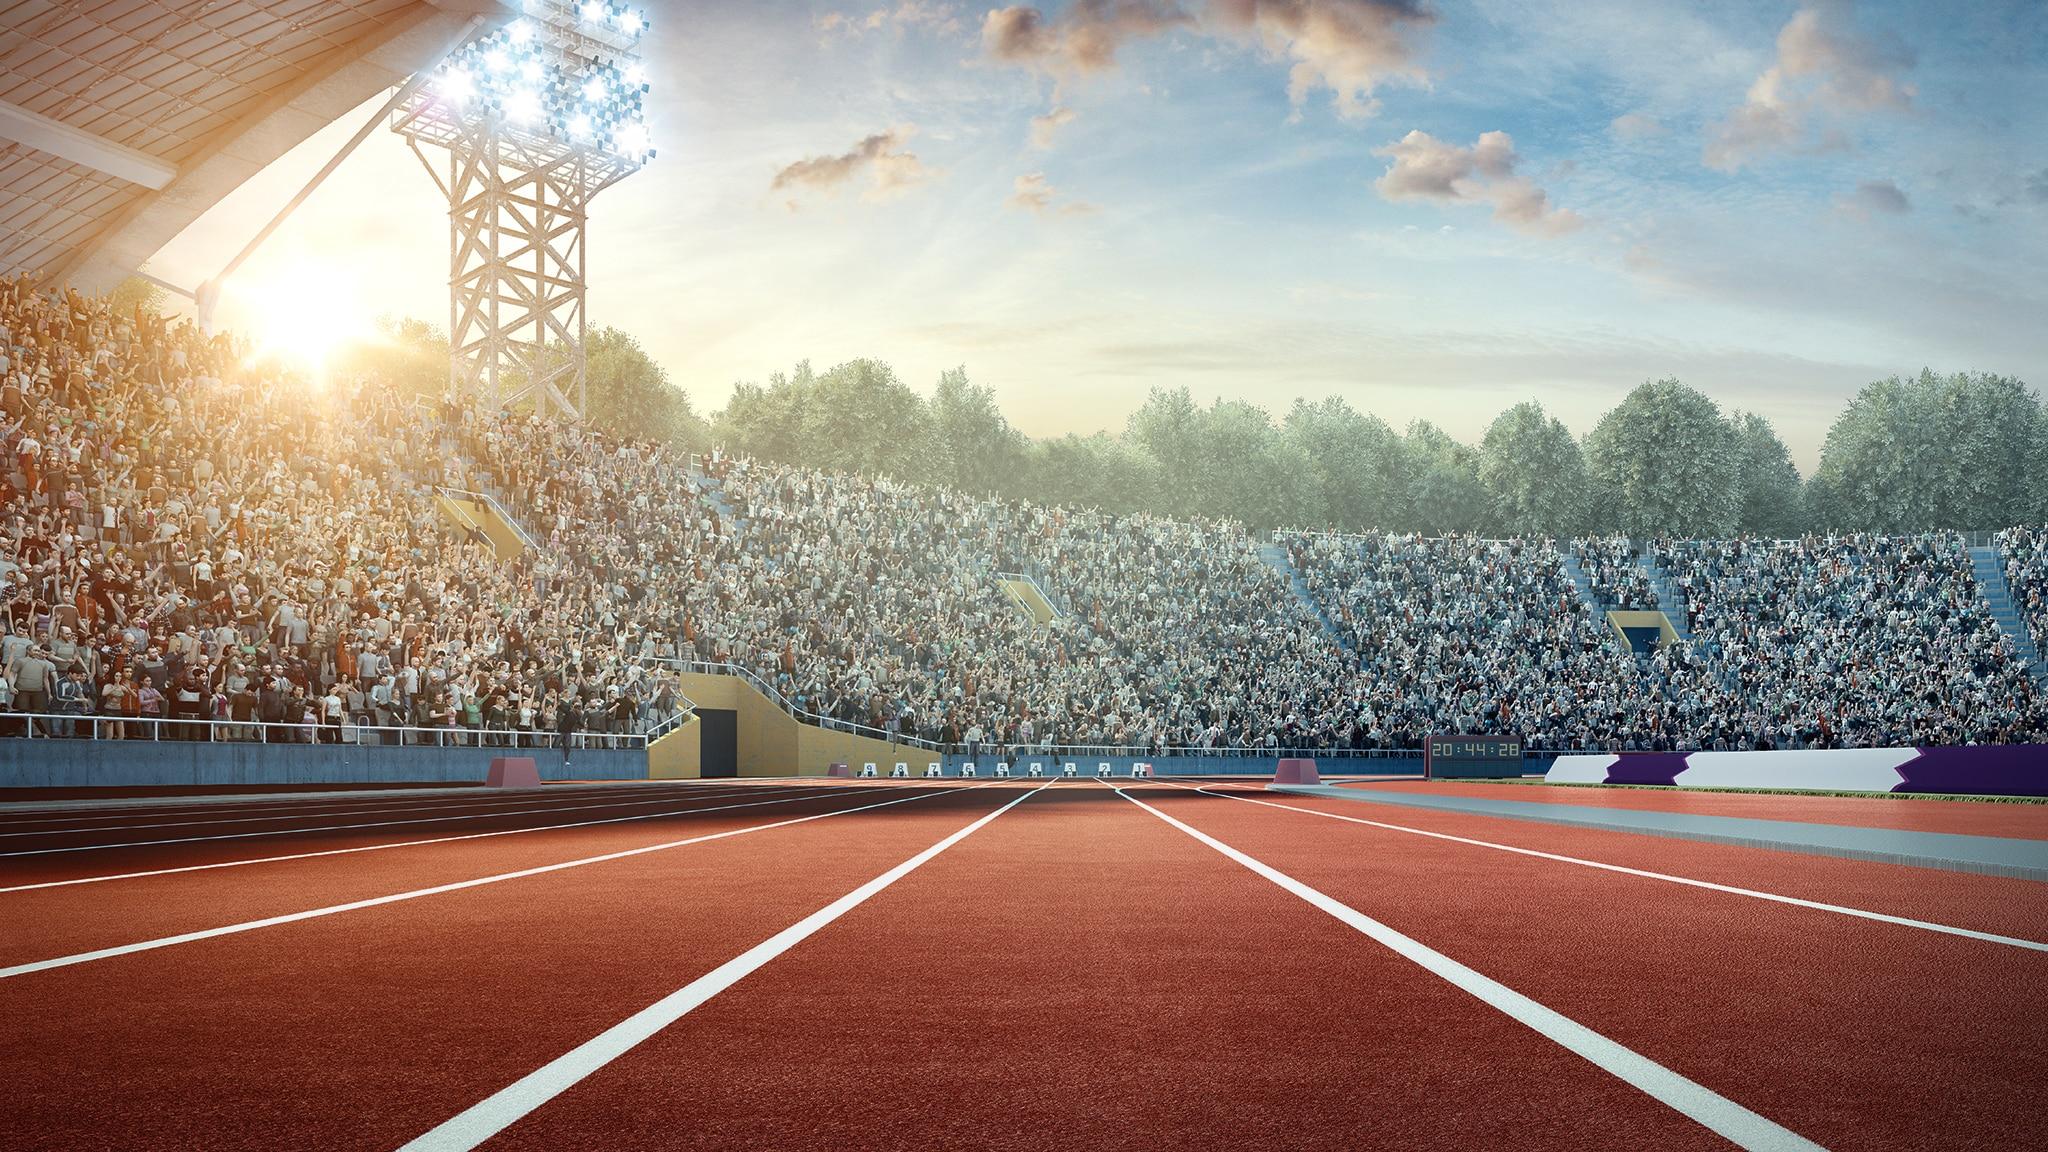 Rai Sport+ HD Atletica Leggera: Campionati Europei Indoor - 2a giornata